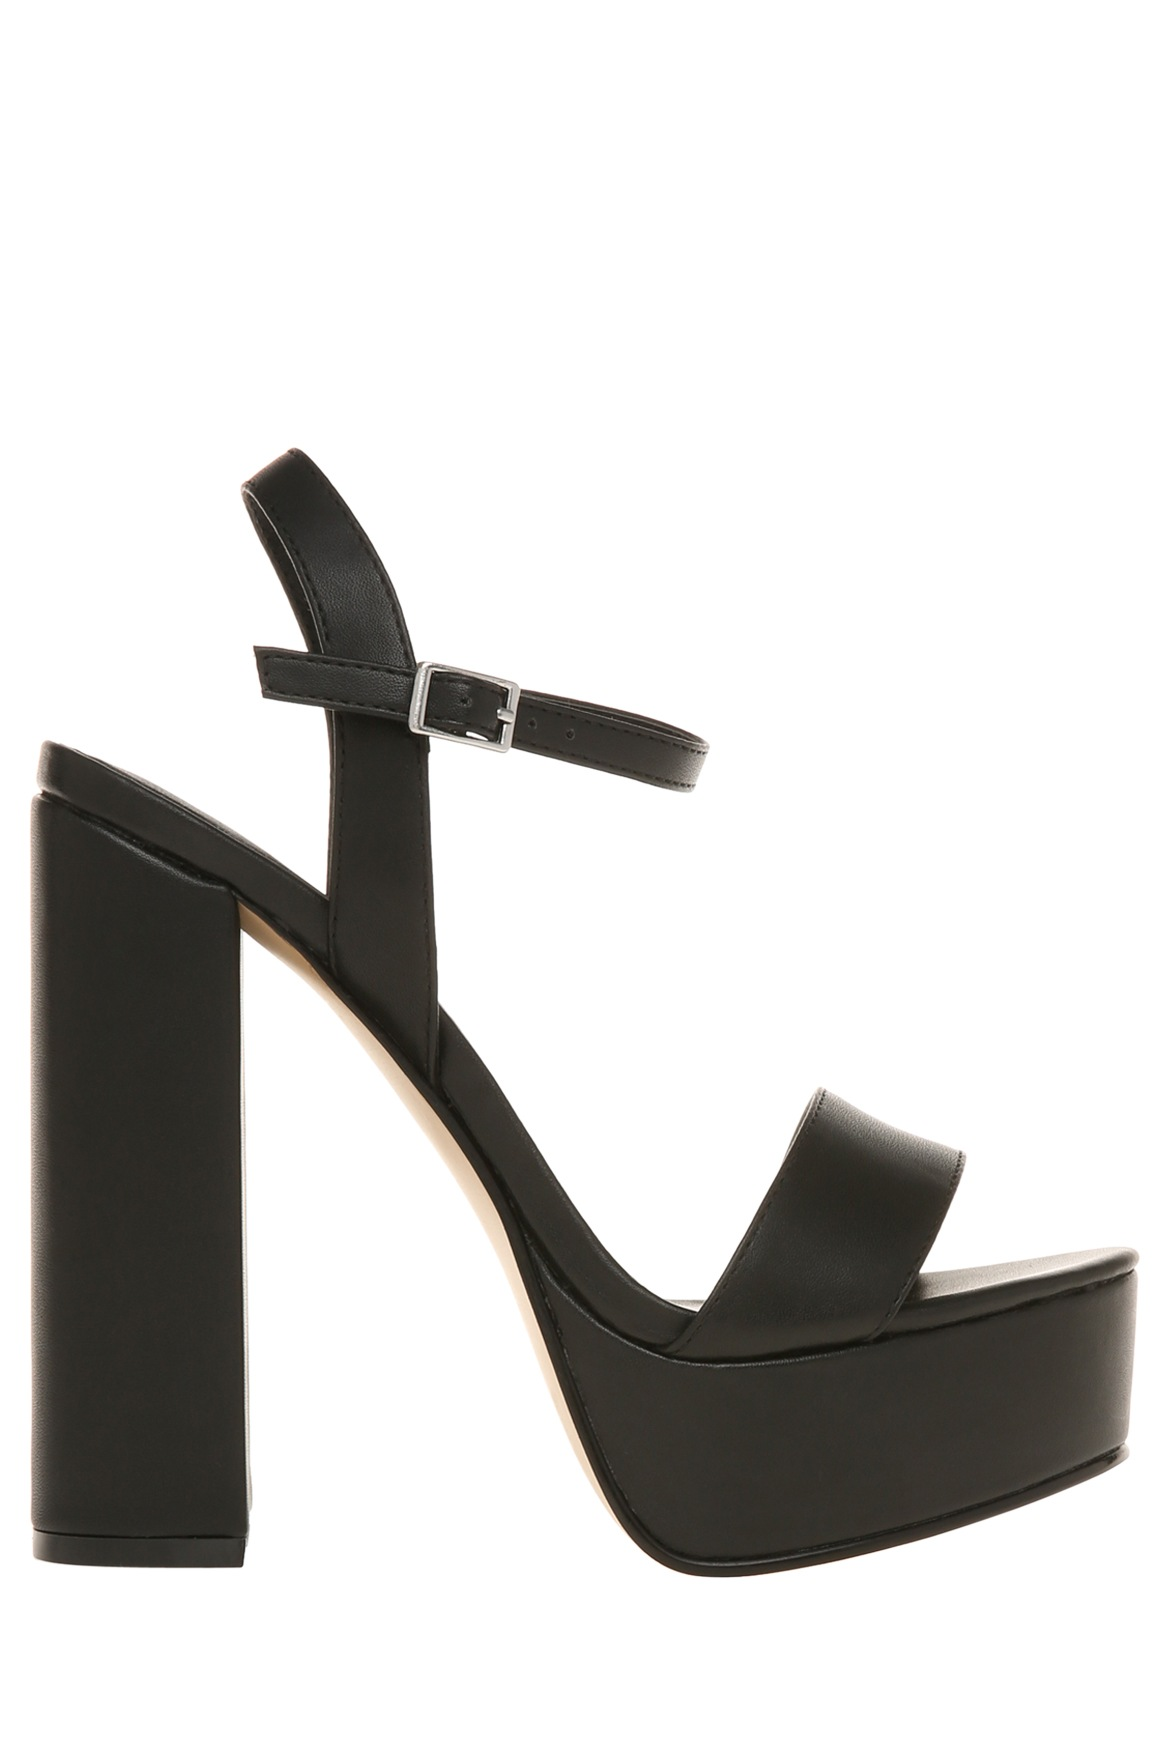 Black sandals myer - Black Sandals Myer 35